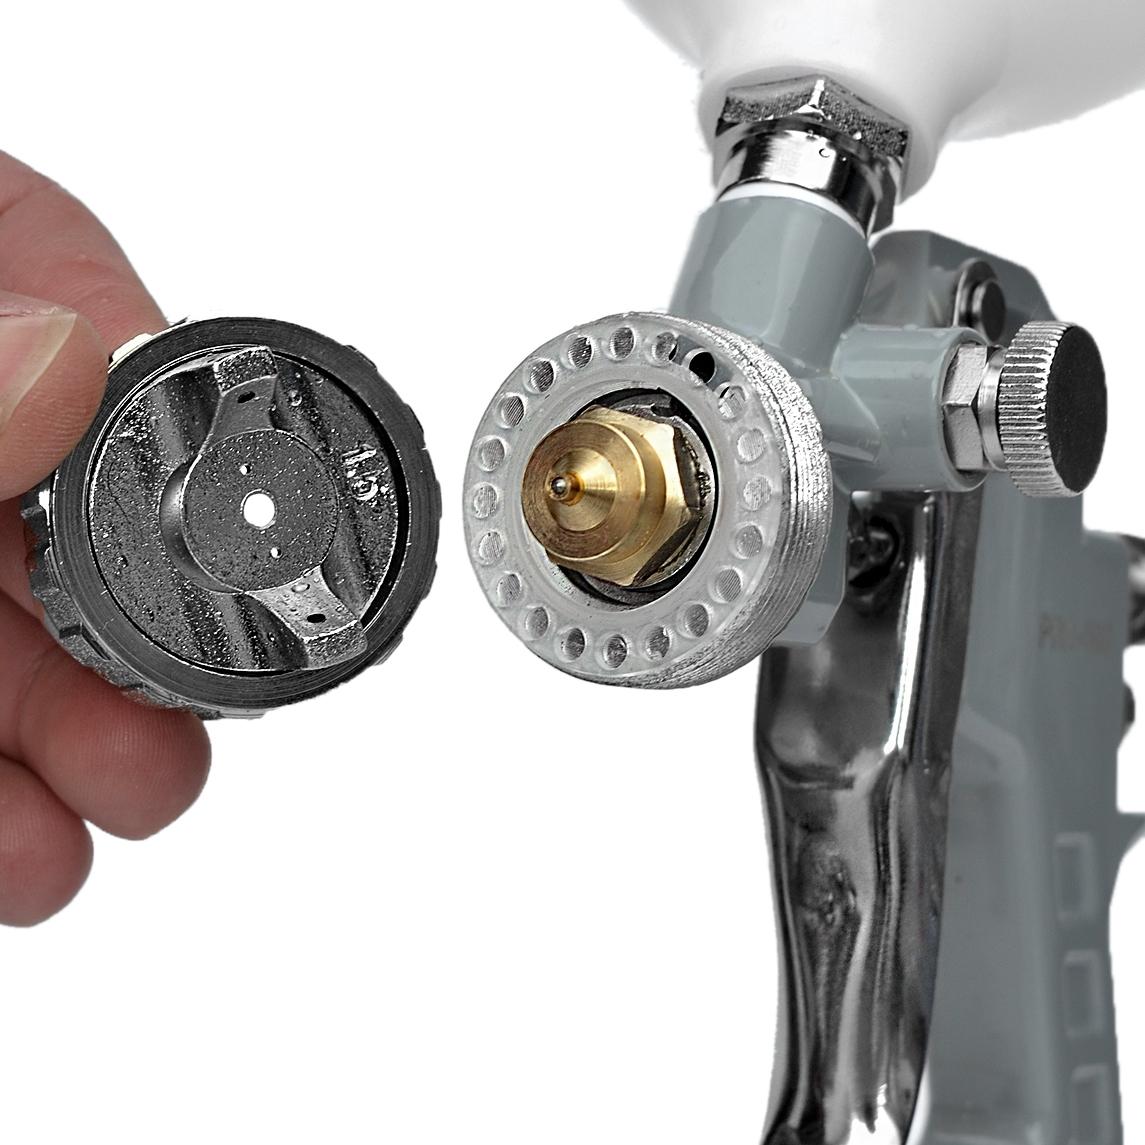 Kit Pistola De Pintura Hvlp Ldr Pro 530 + Pistola Gravidade Uso Geral Ldr Pro 500 Kp5 - Ferramentas MEP